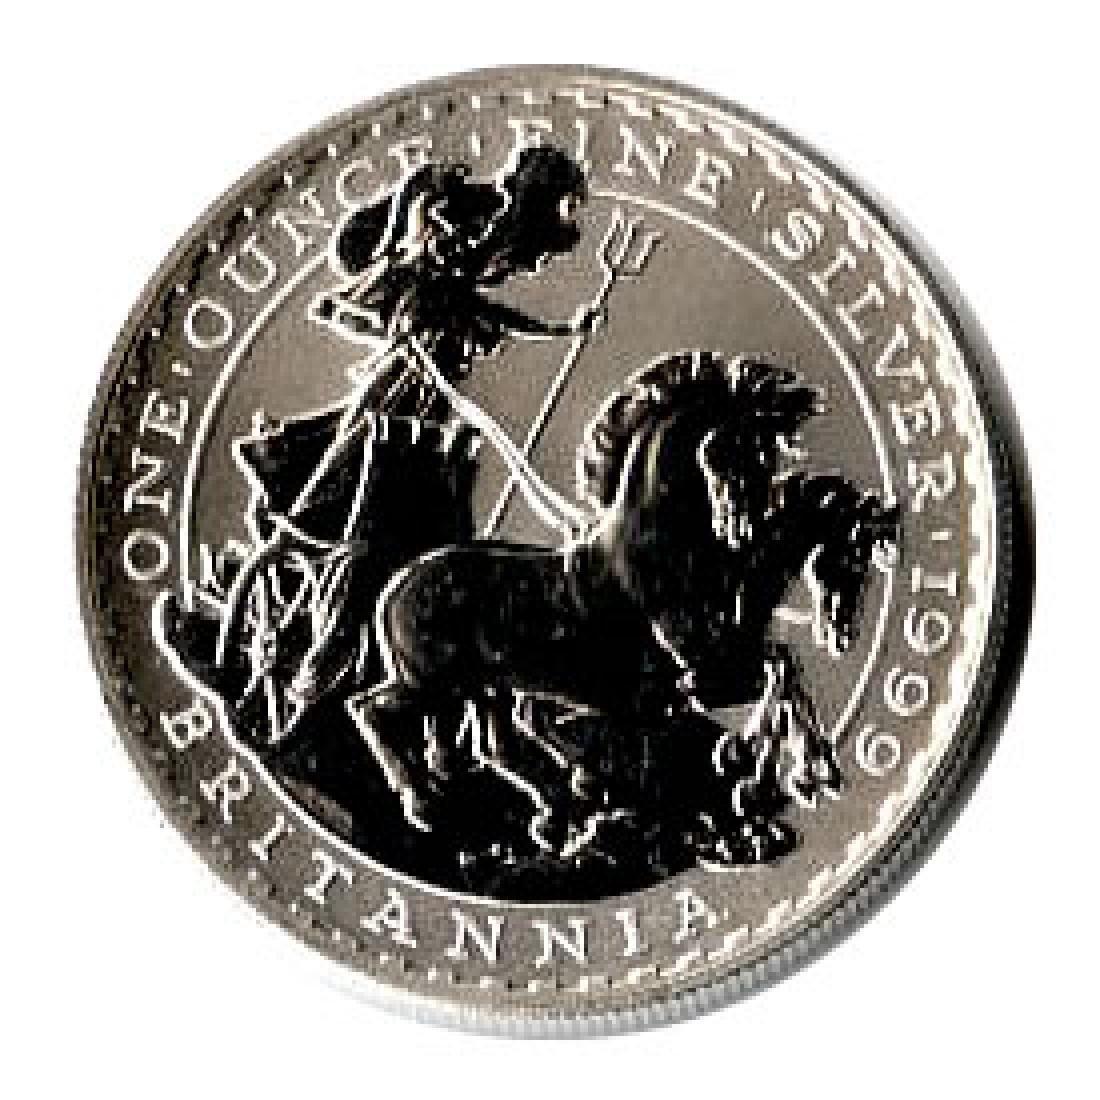 Uncirculated Silver Britannia 1 oz 1999